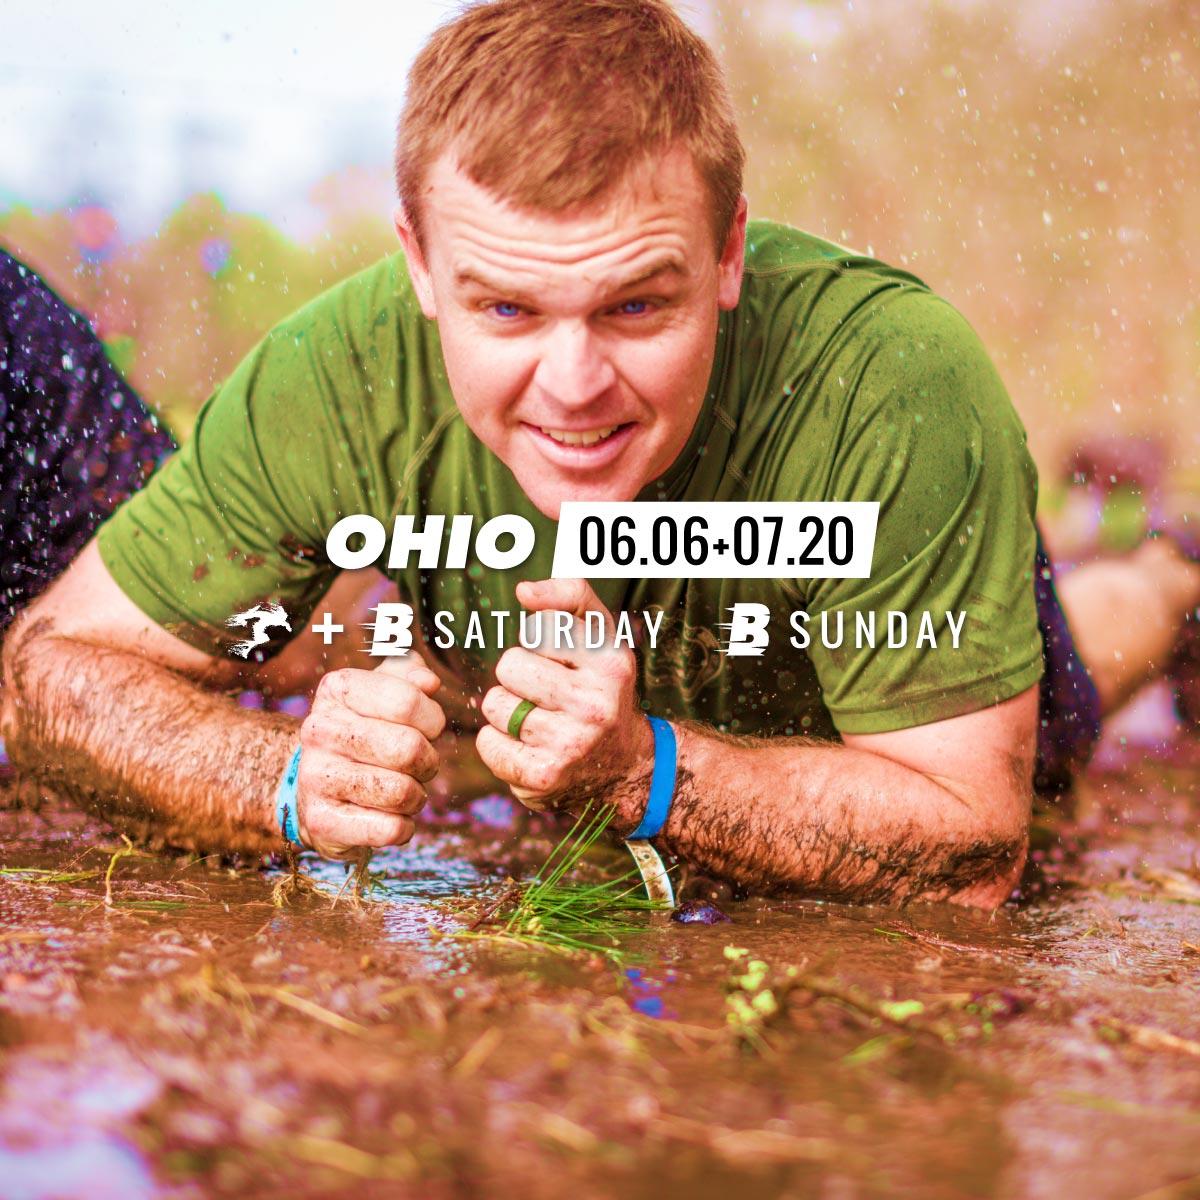 Spectator Pass - Savage Race Ohio 2020